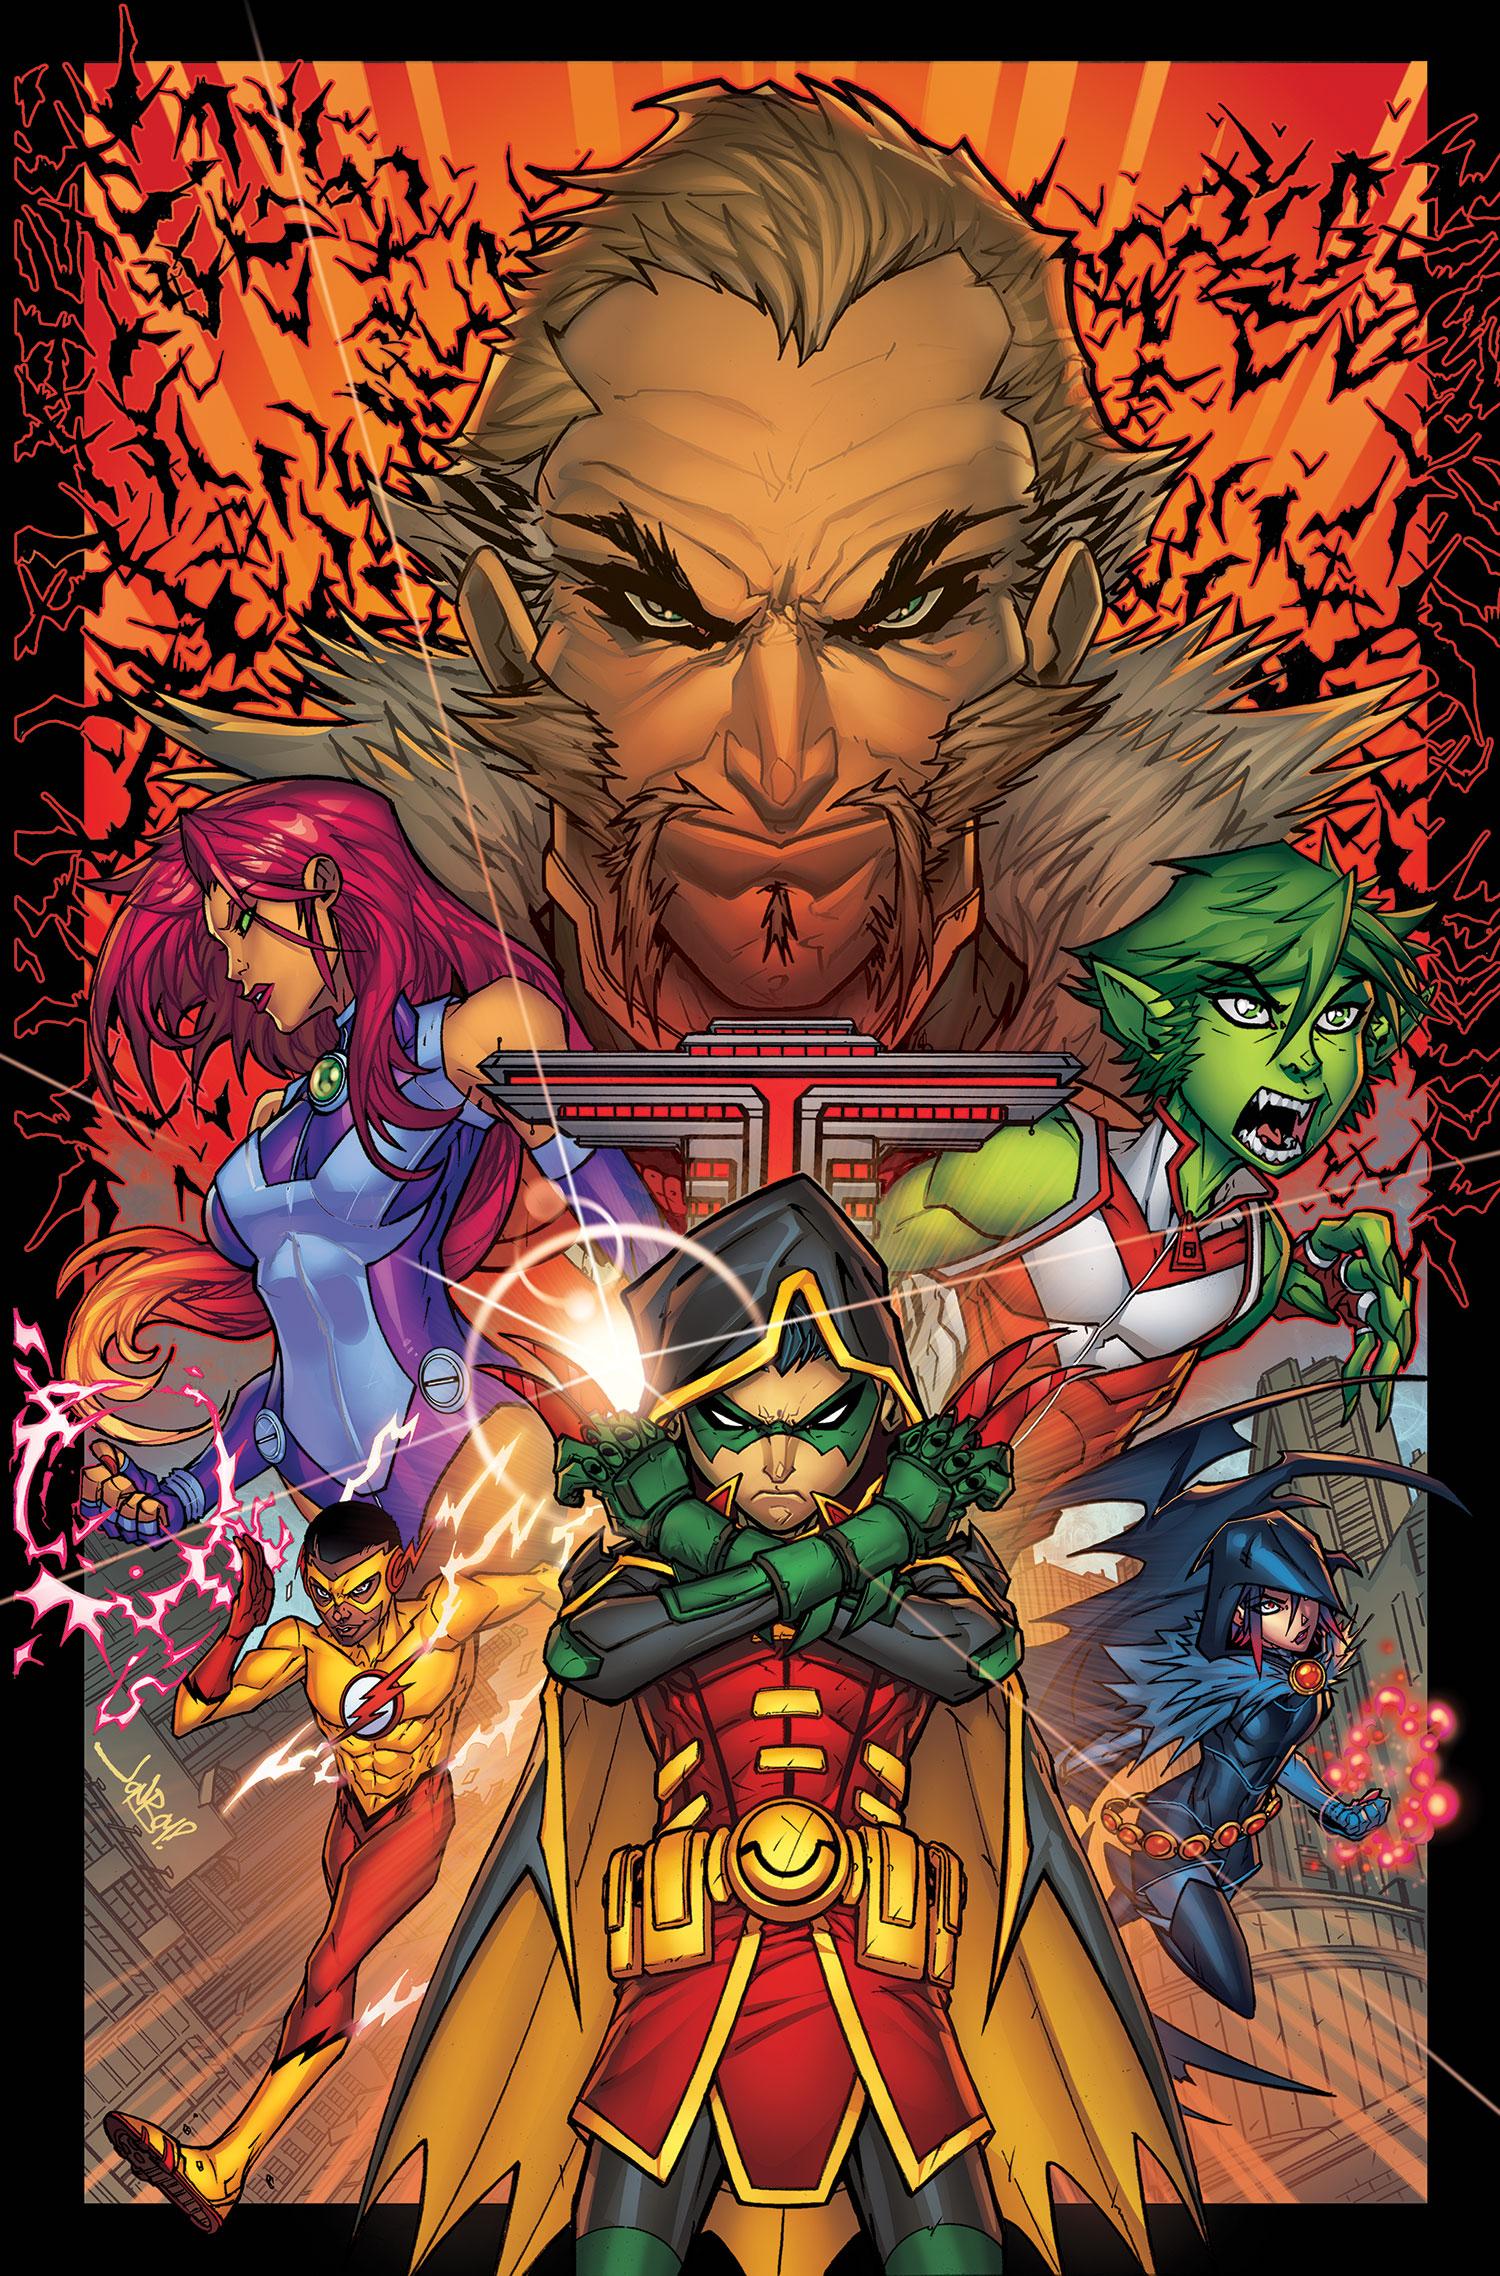 Teen Titans Vol 6 1 Textless.jpg